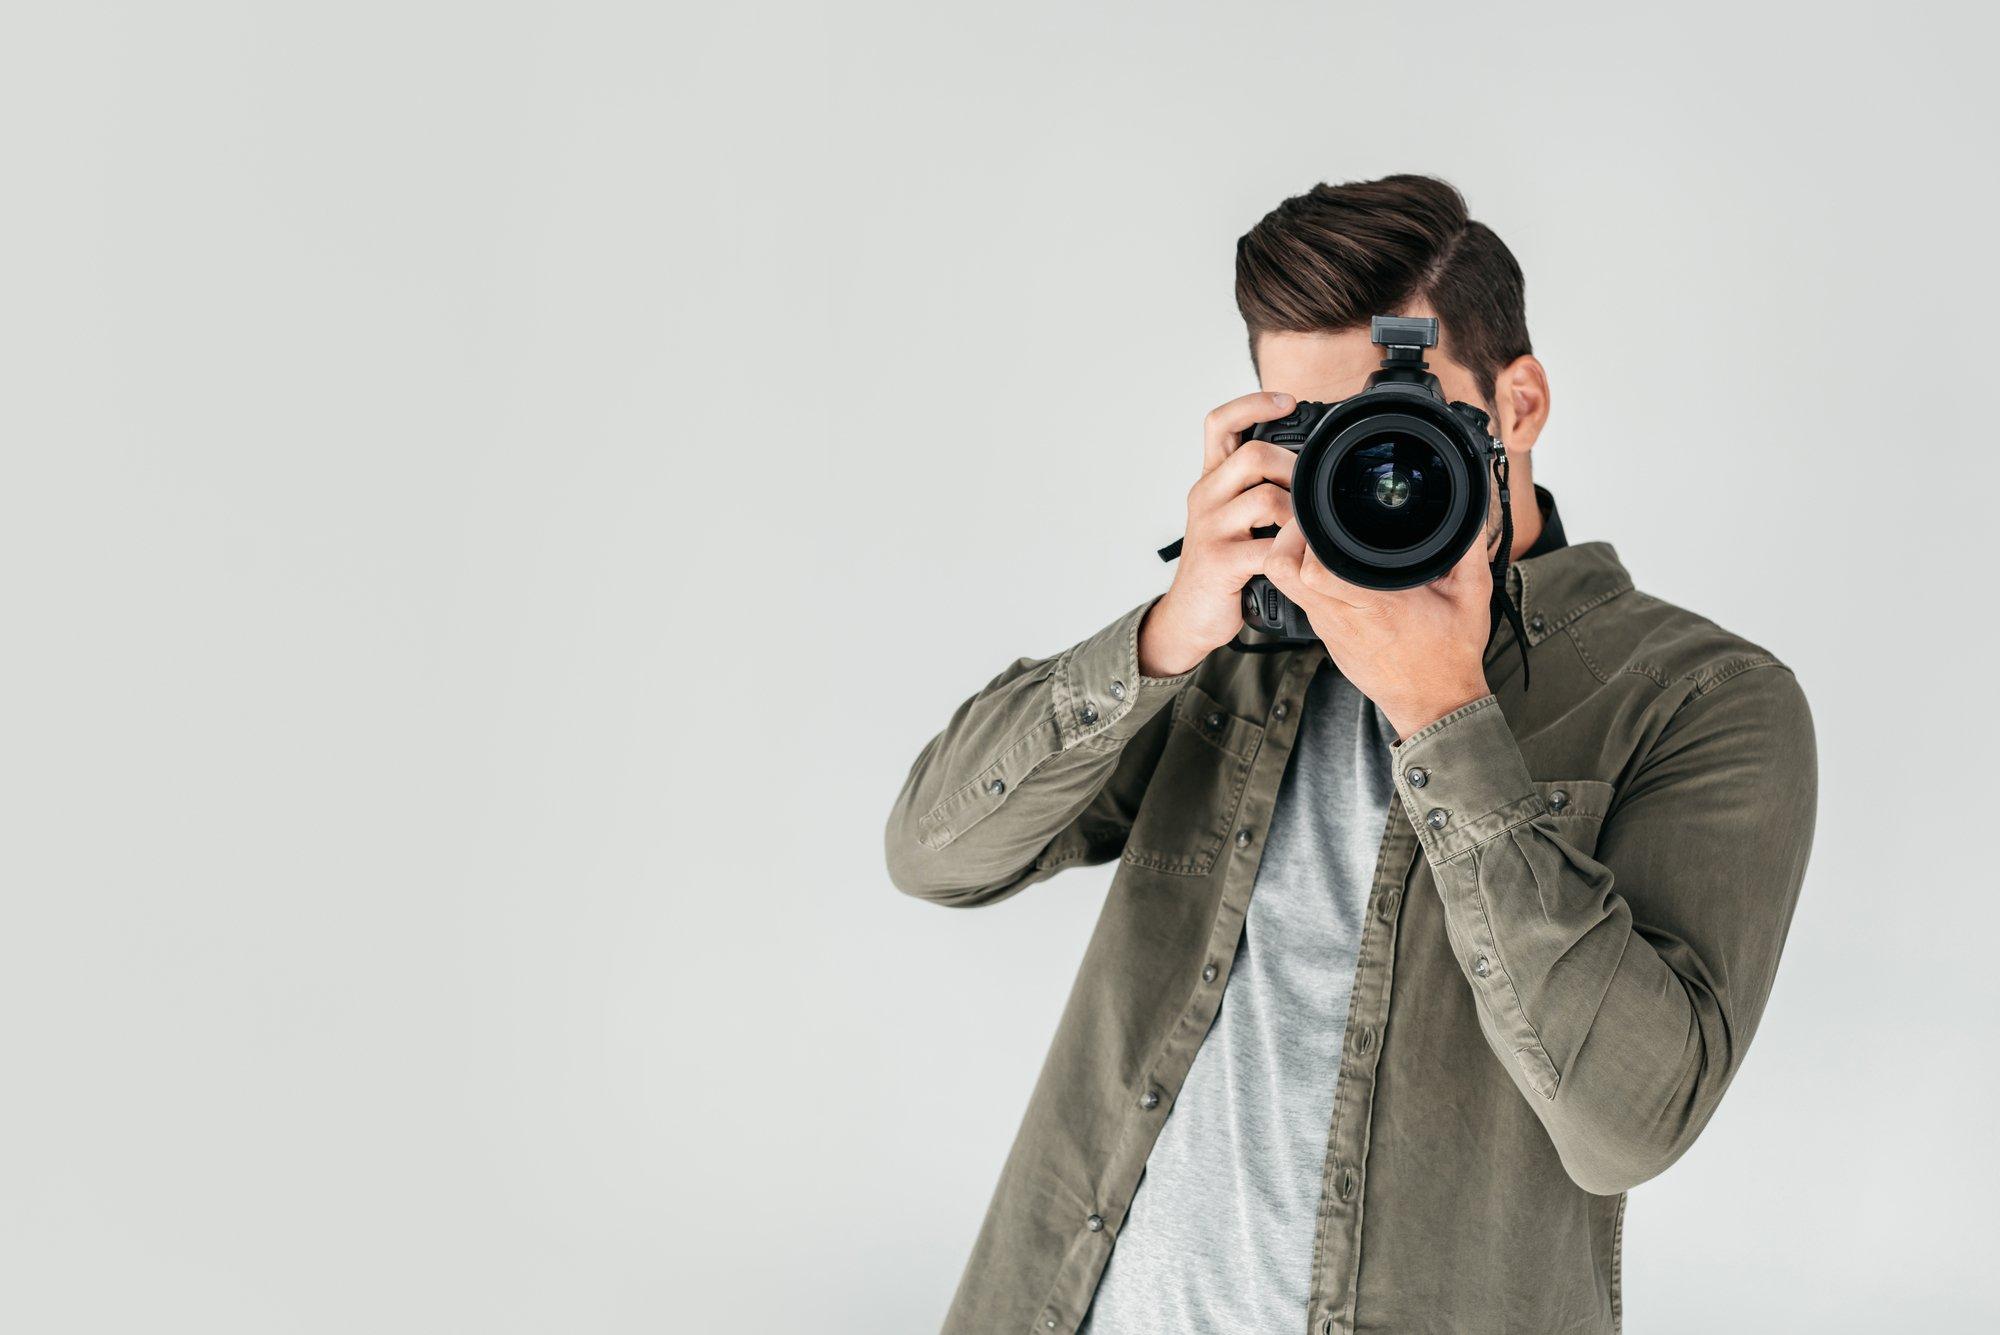 Photographer with digital photo camera